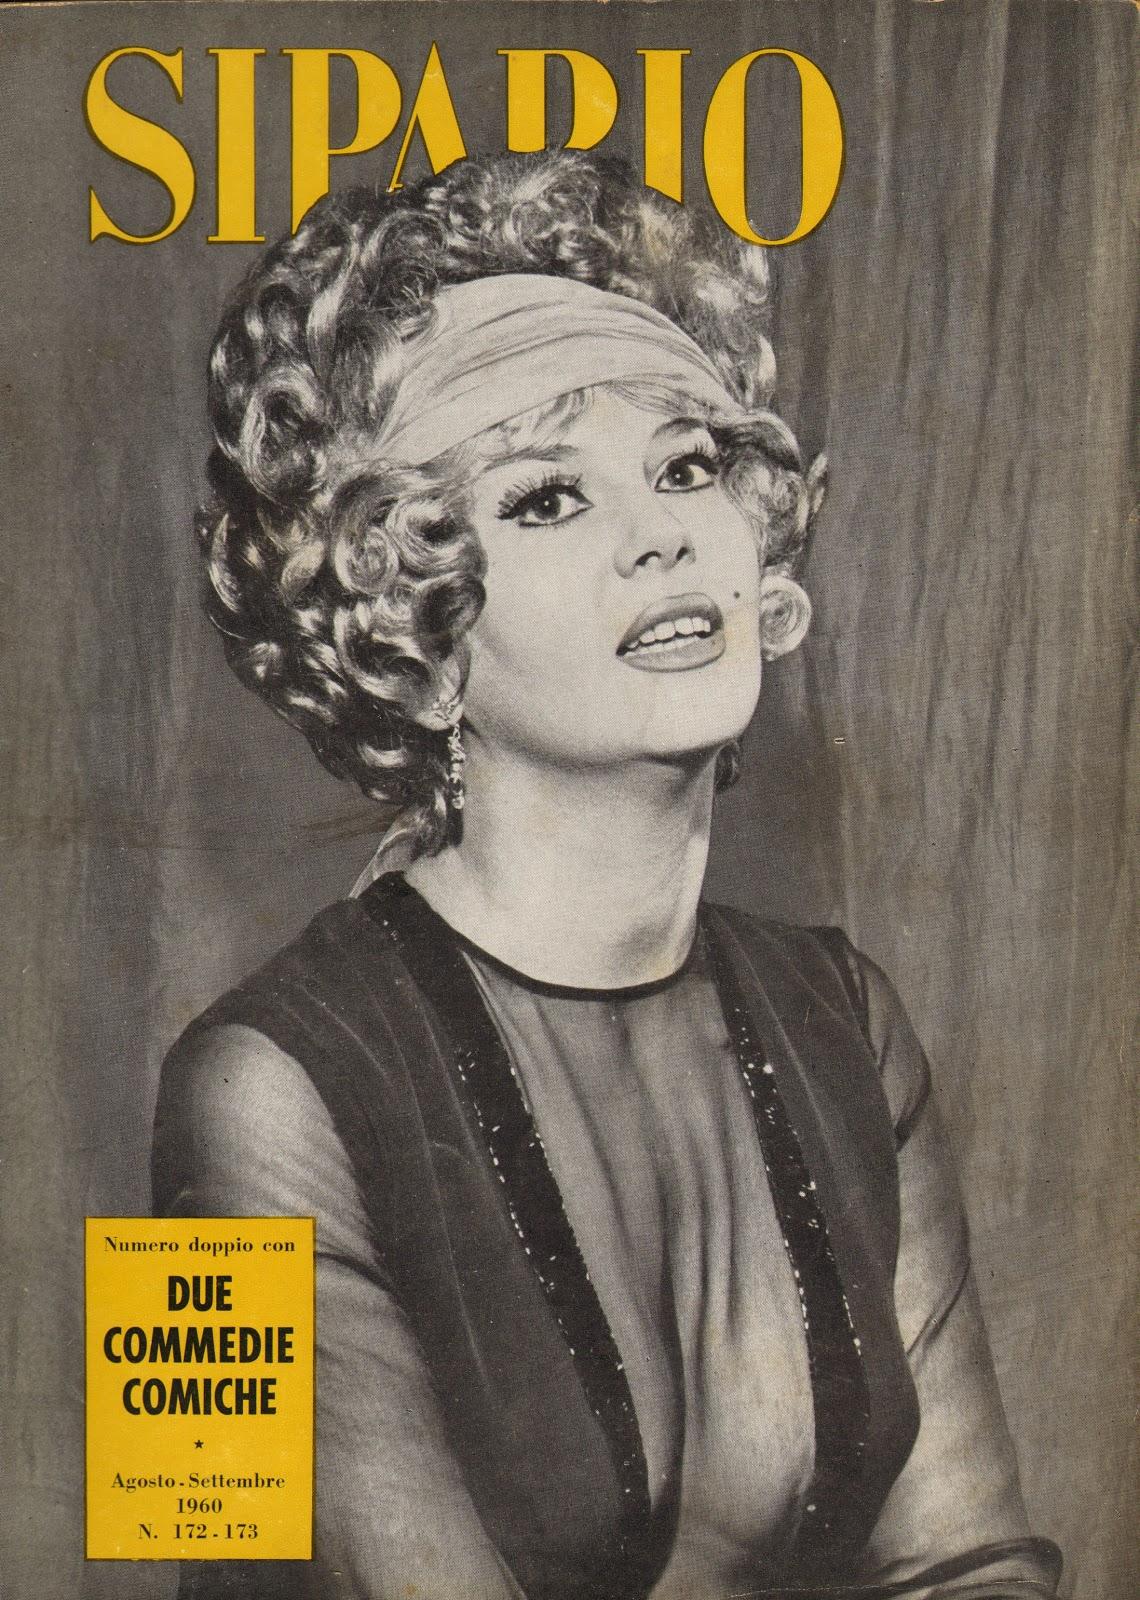 Franca Rame (born 1929)